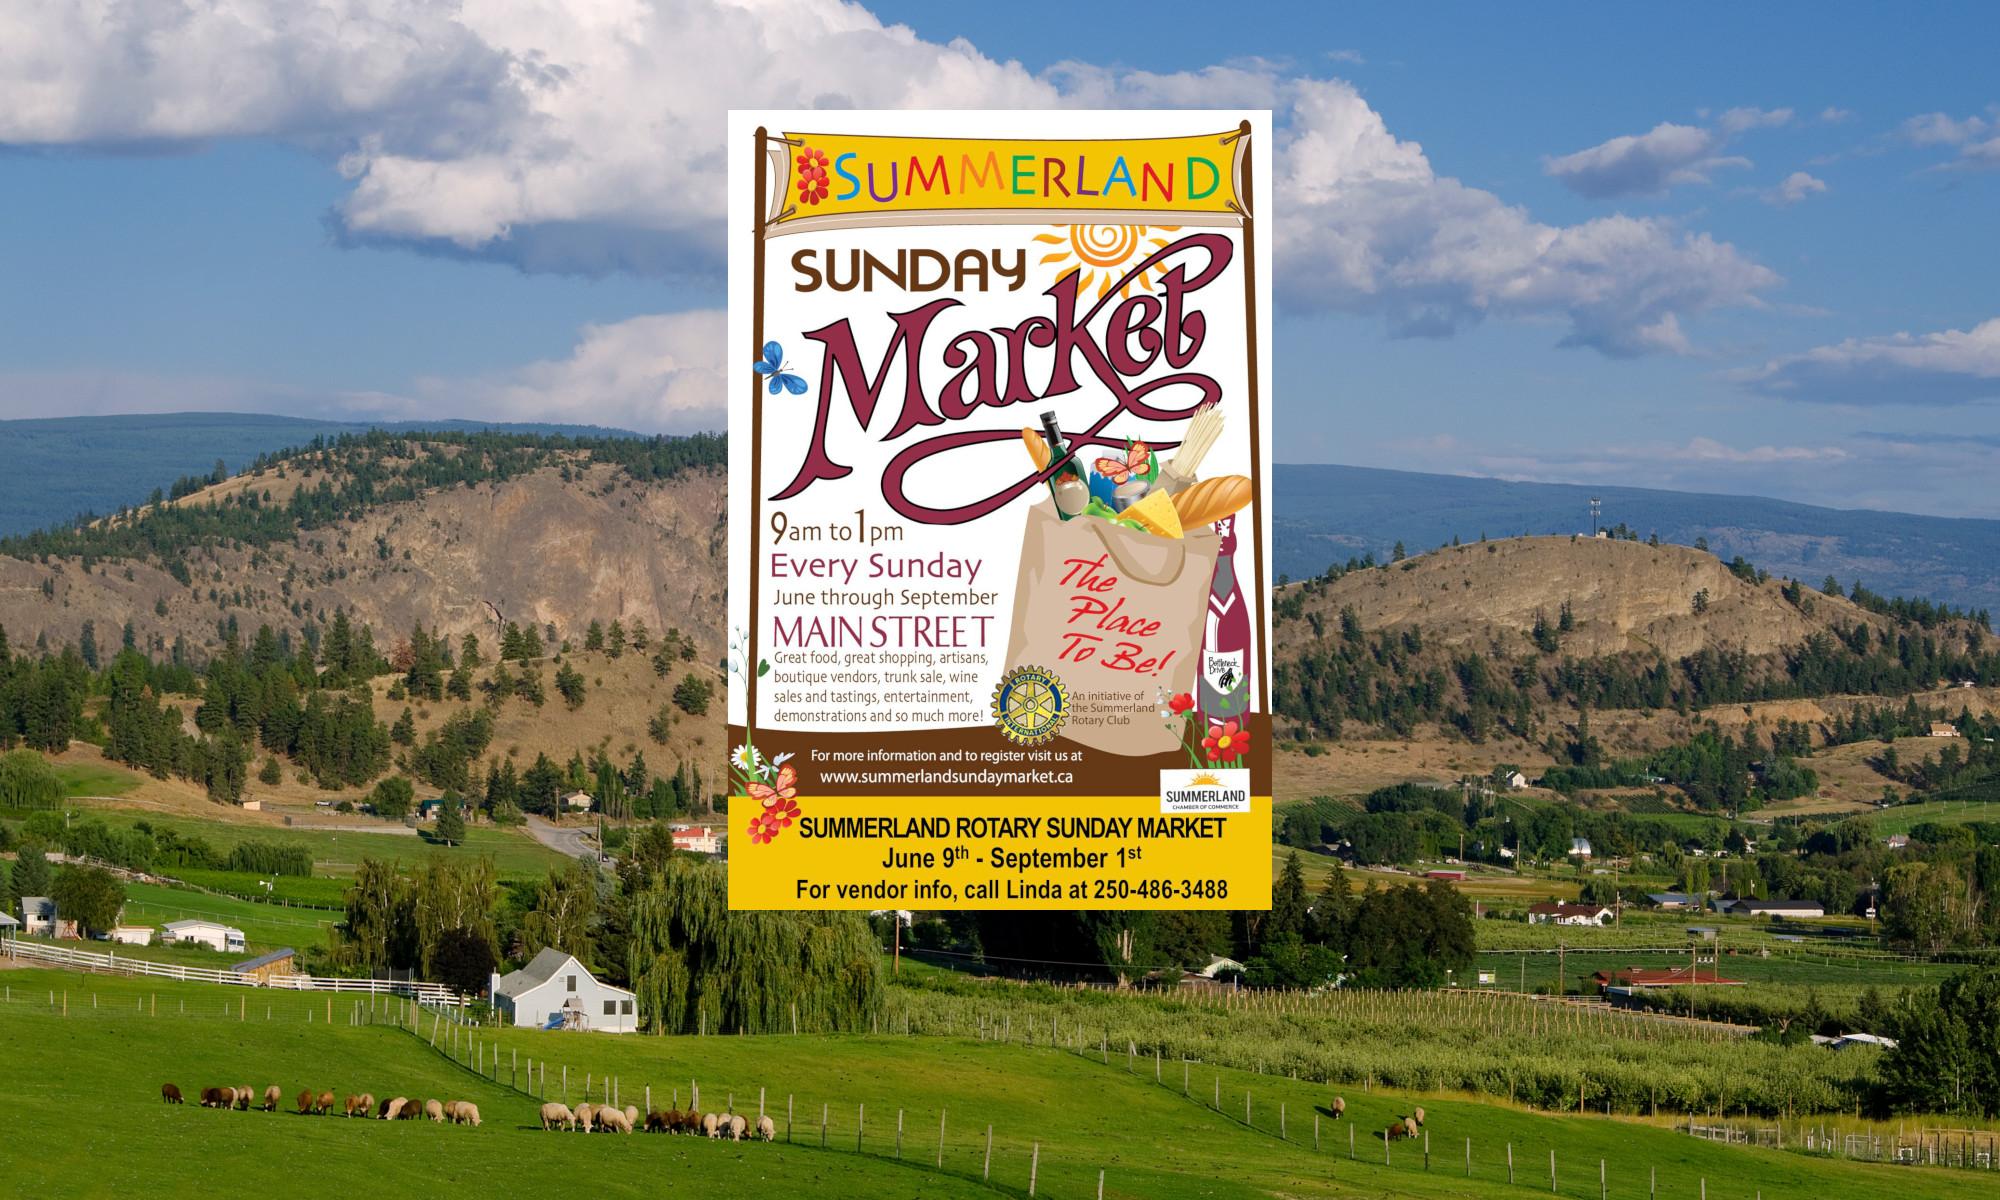 Summerland Rotary Sunday Market